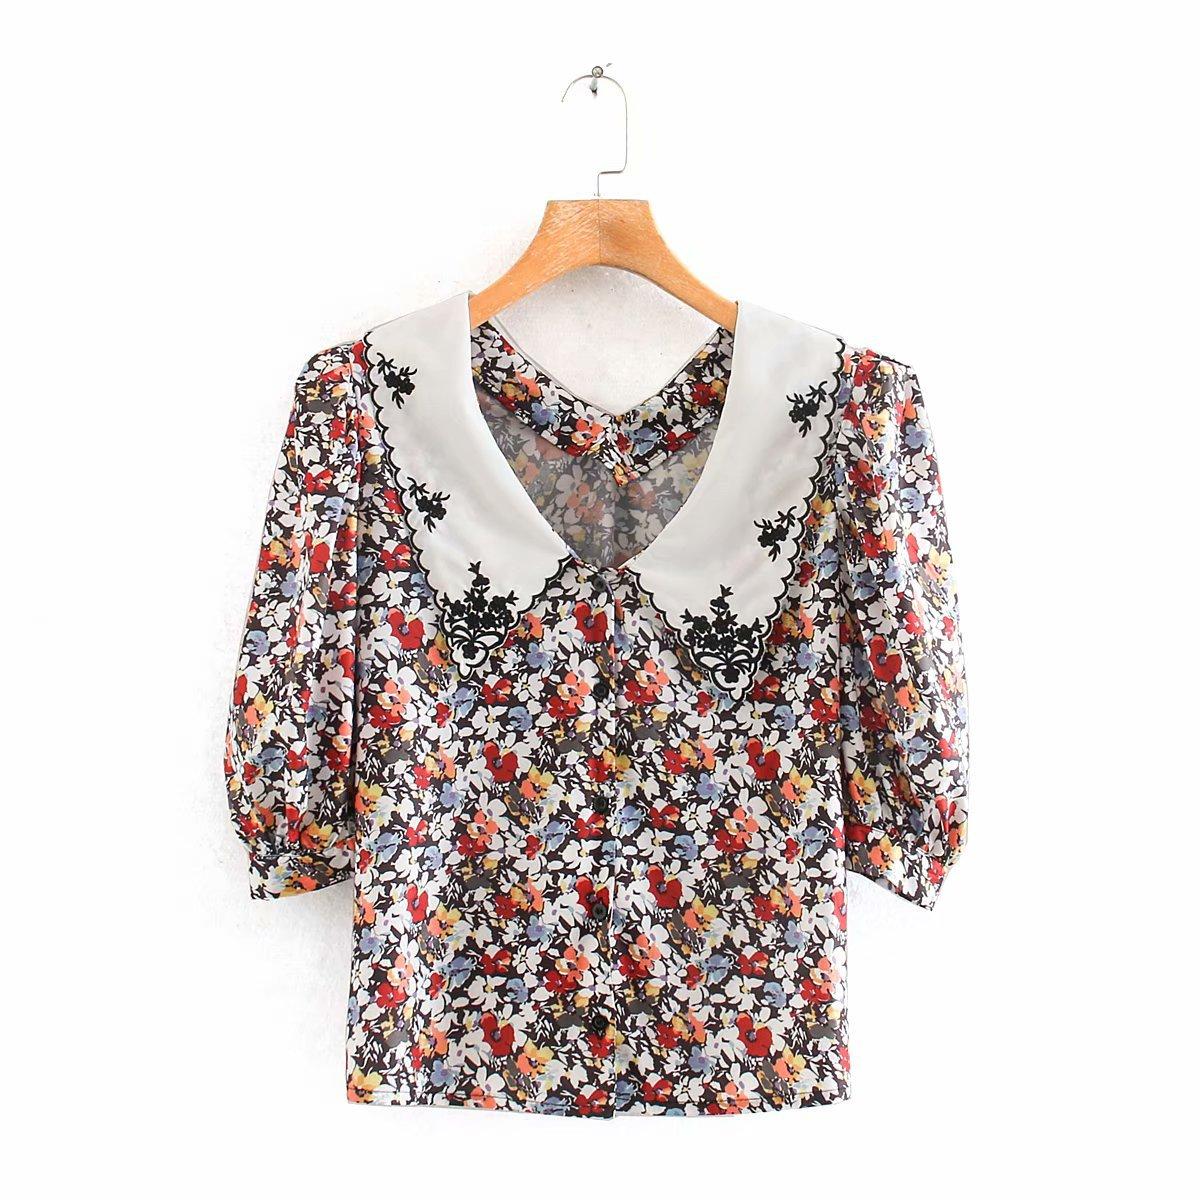 2020 Spring Summer New Floral Flower Print Zaraing Women Blouse Shirt Sheining Vadiming Female Blouse Shirt Sexy Wdd87205